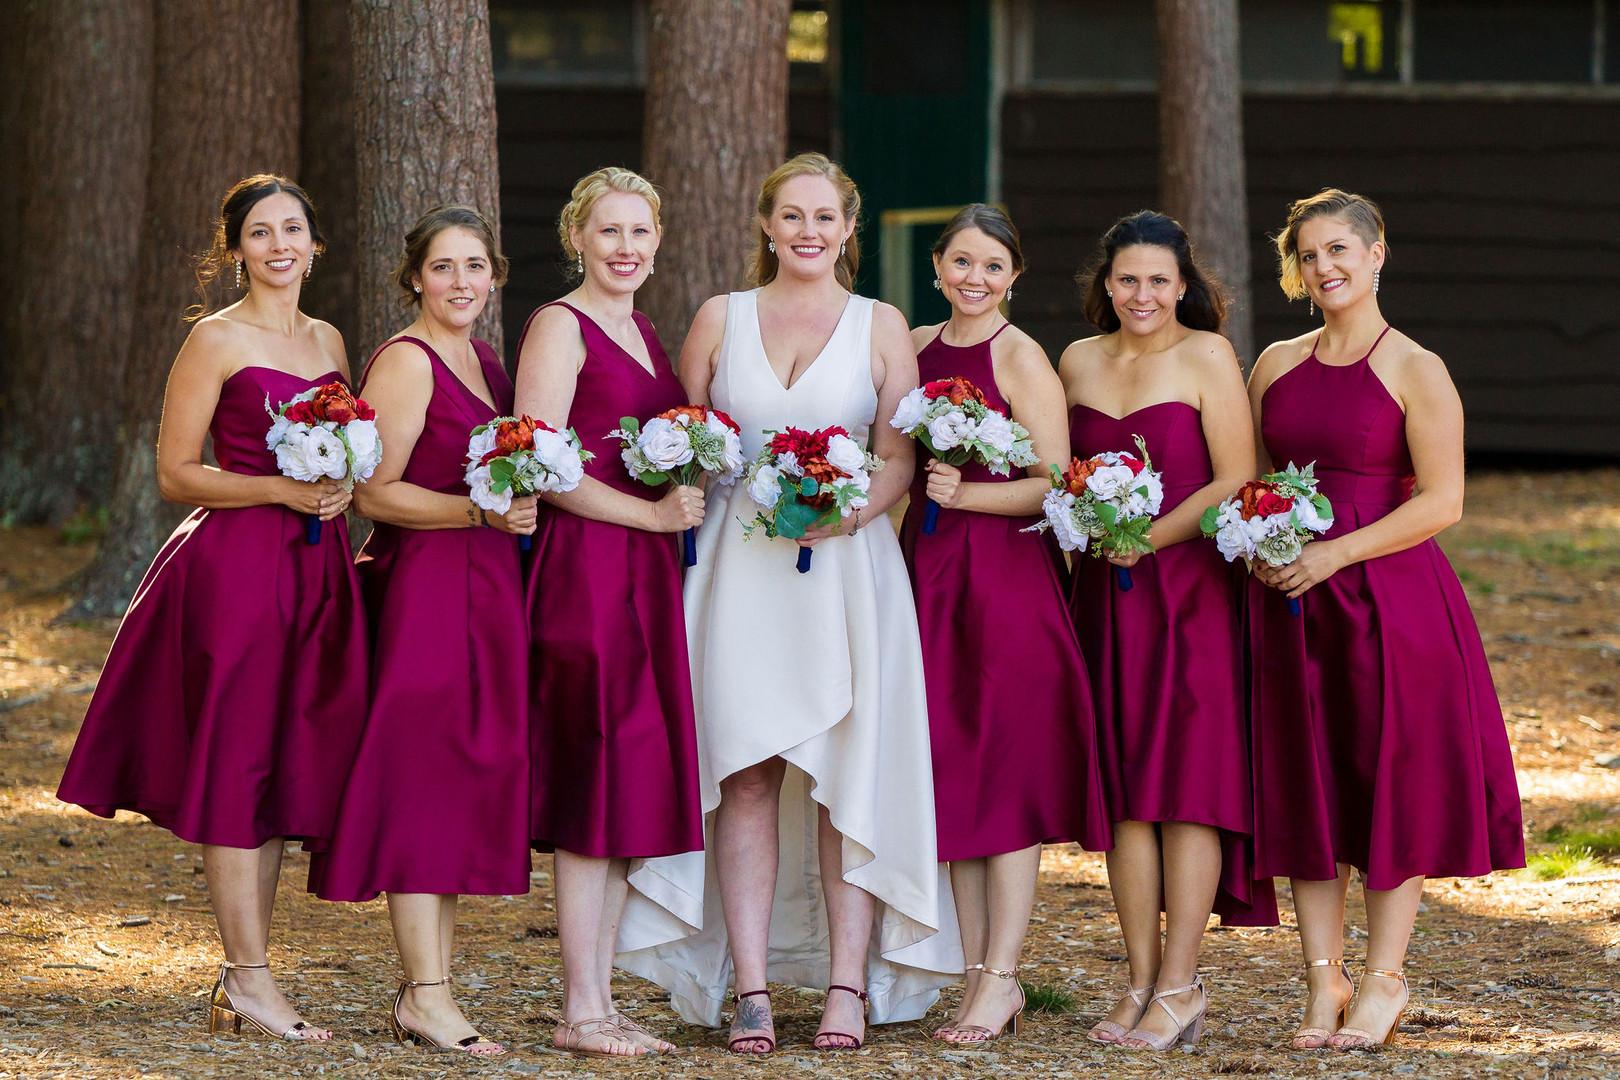 Vermont Bride and Bridesmaids